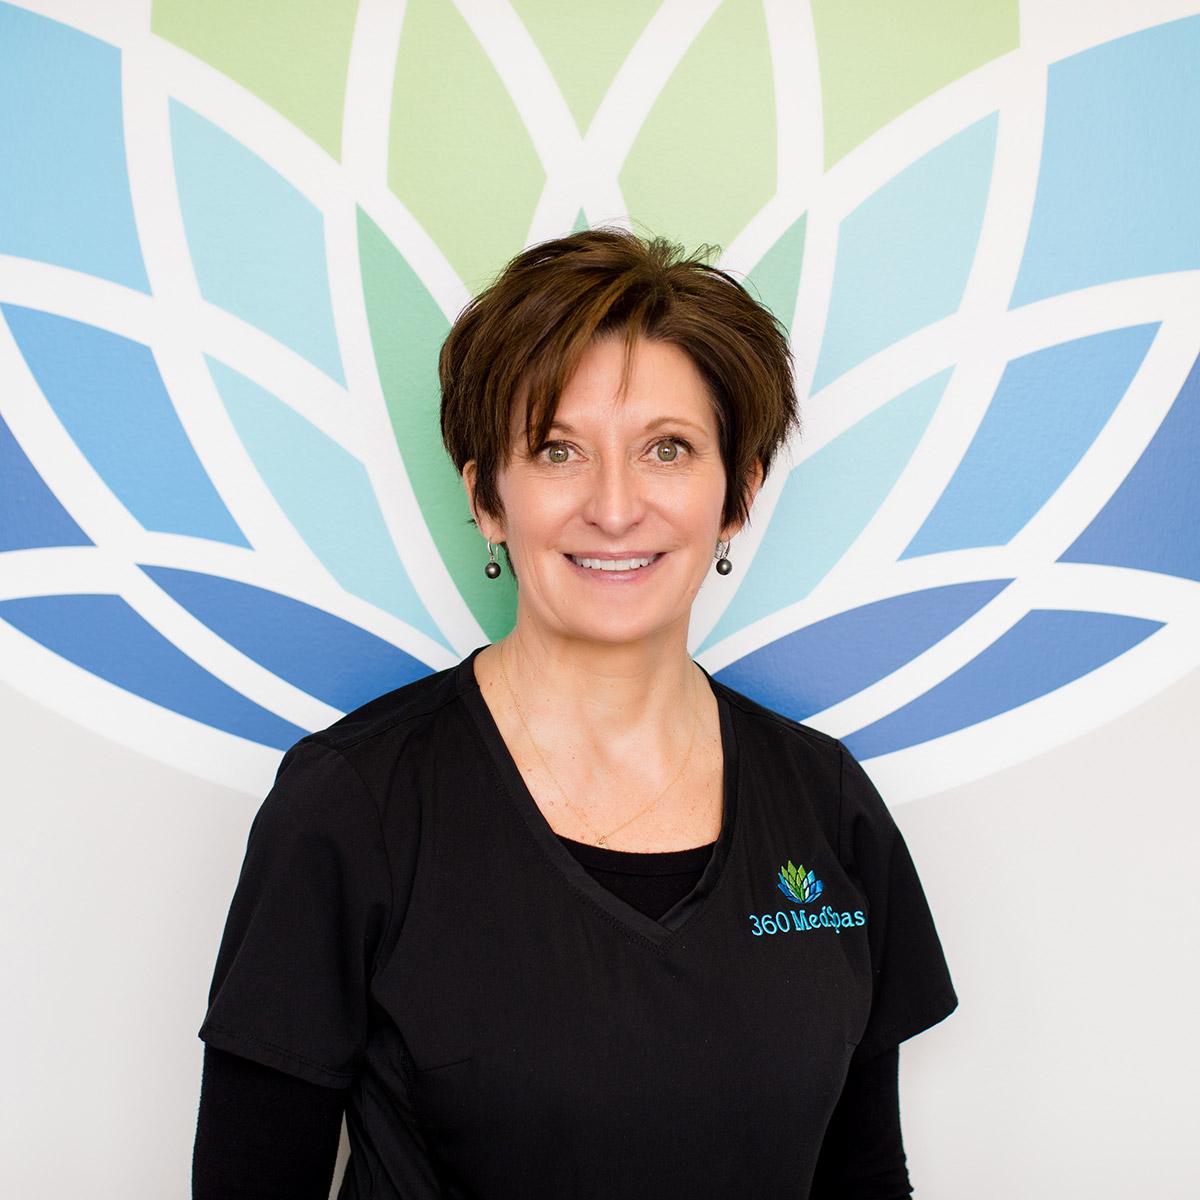 Linda Maher Headshot